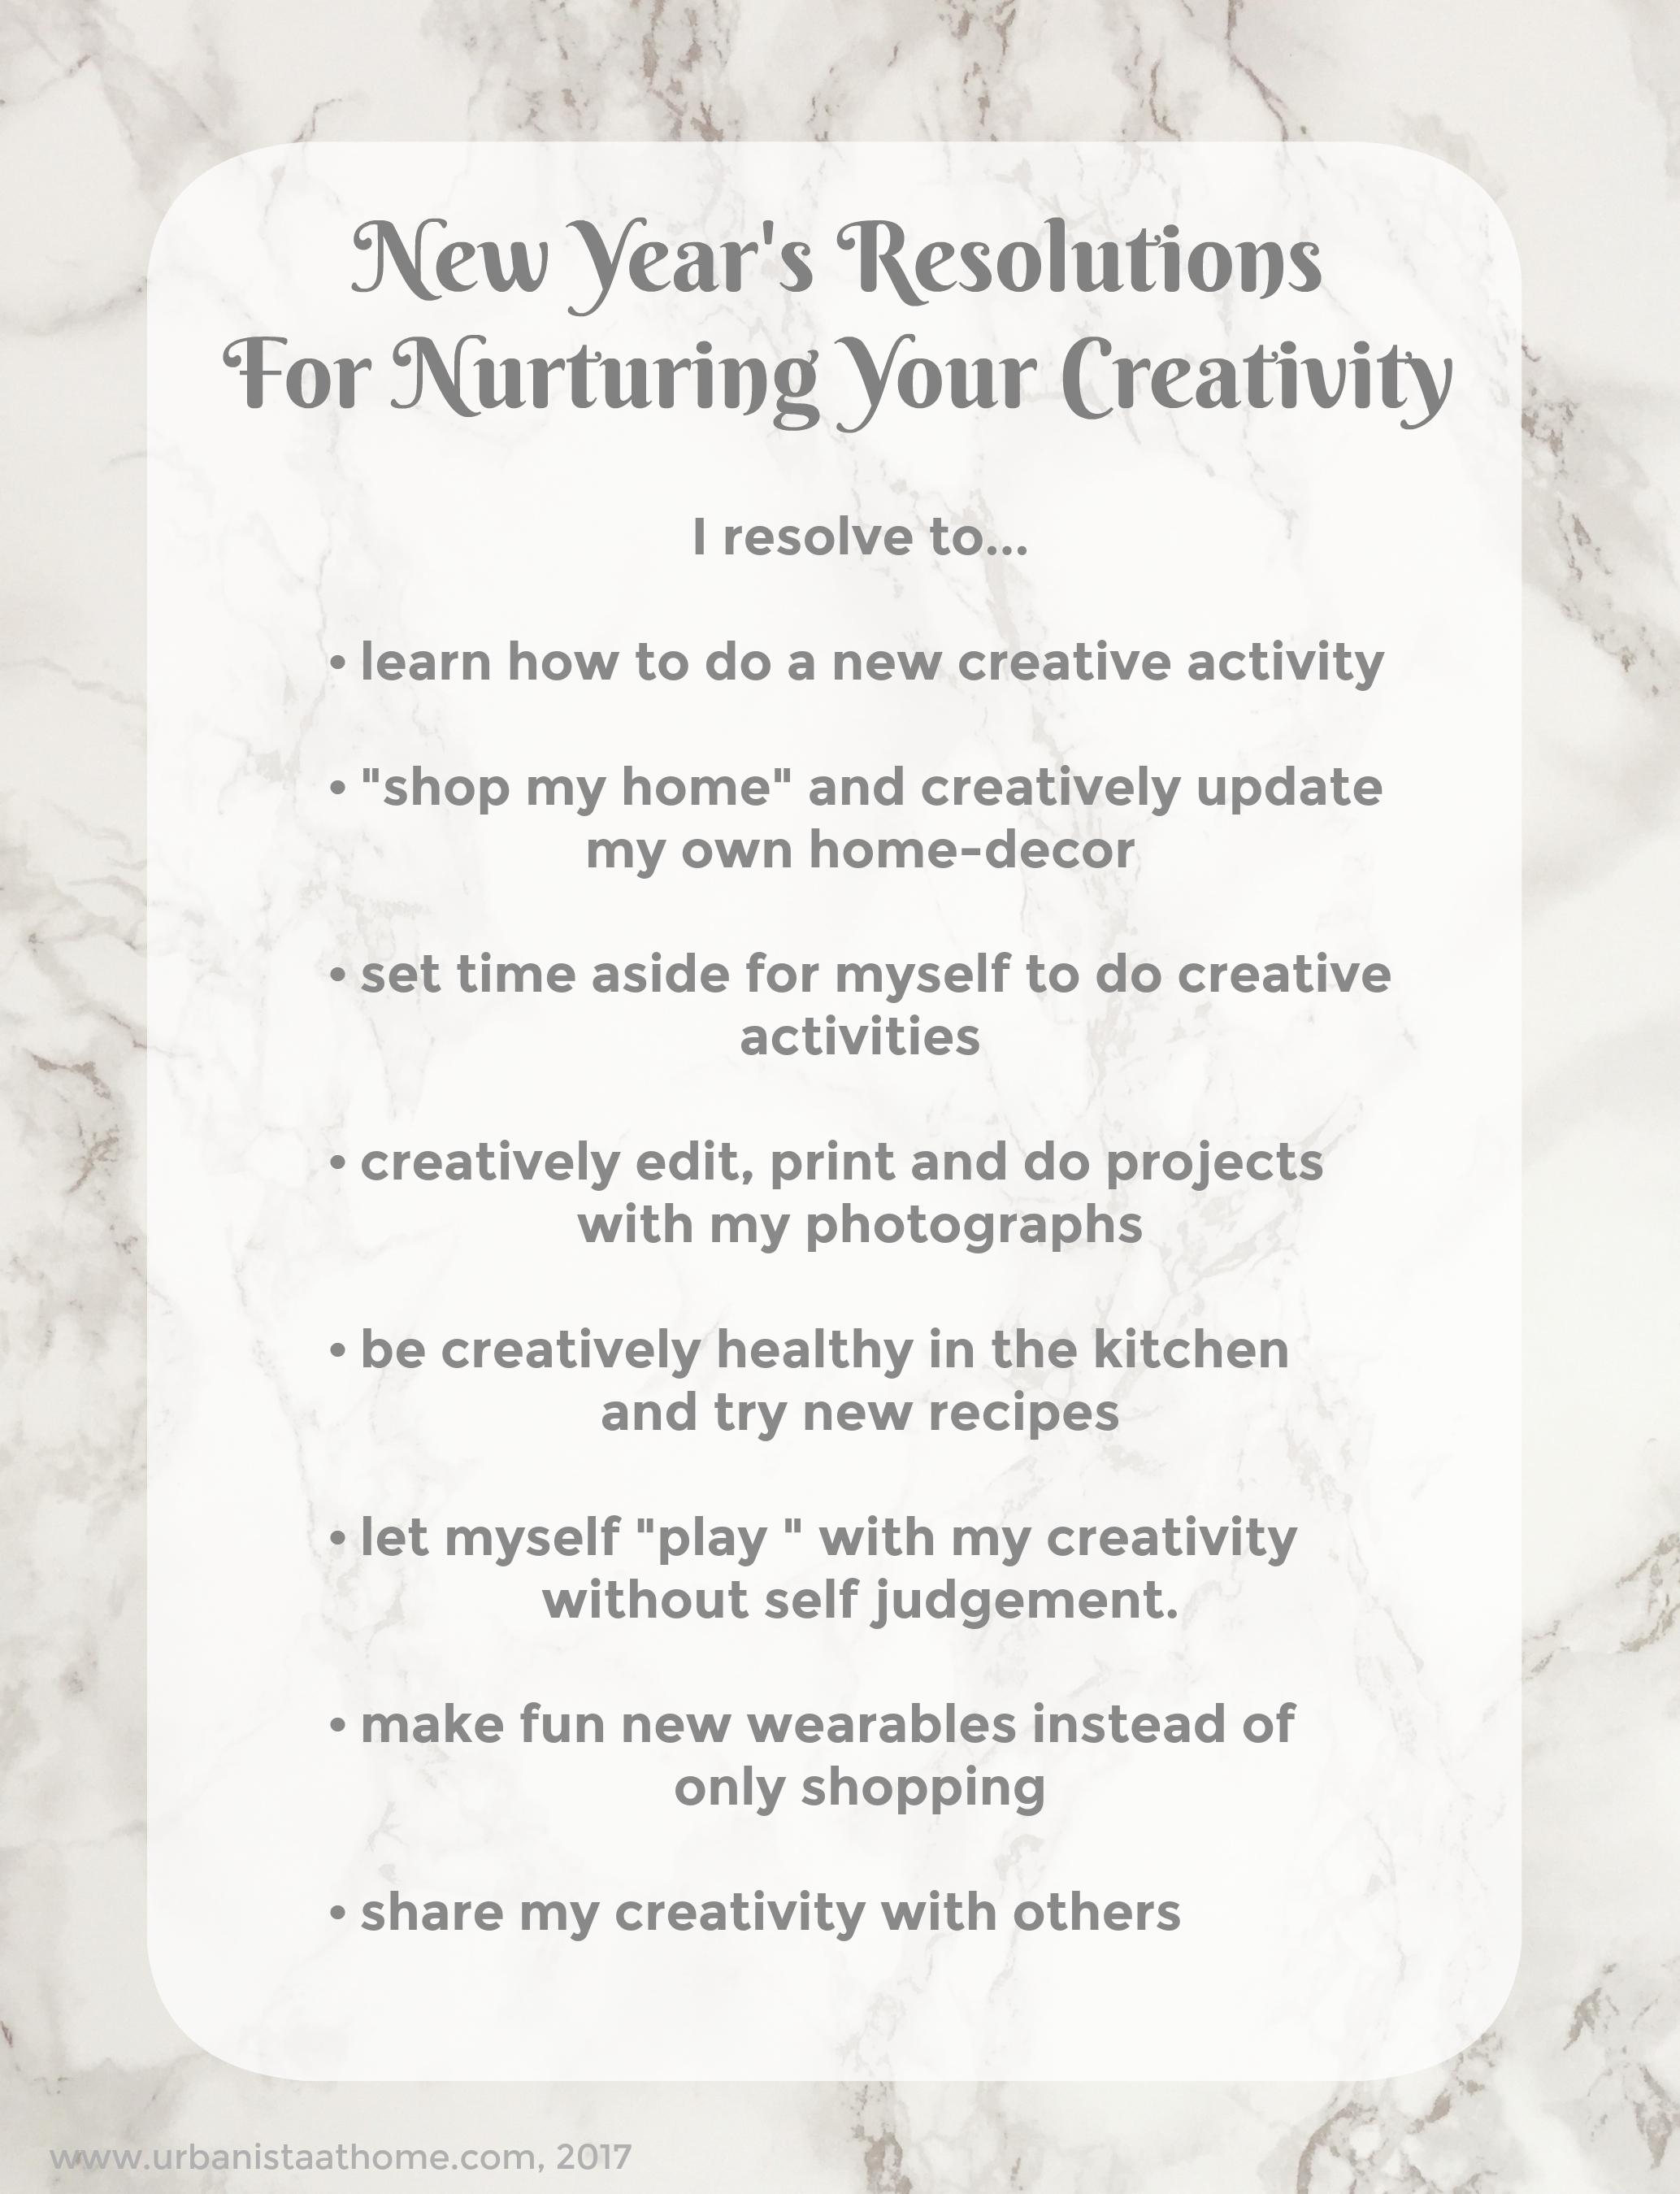 new-years-resolutions-for-creativity-urbanistaathome-com